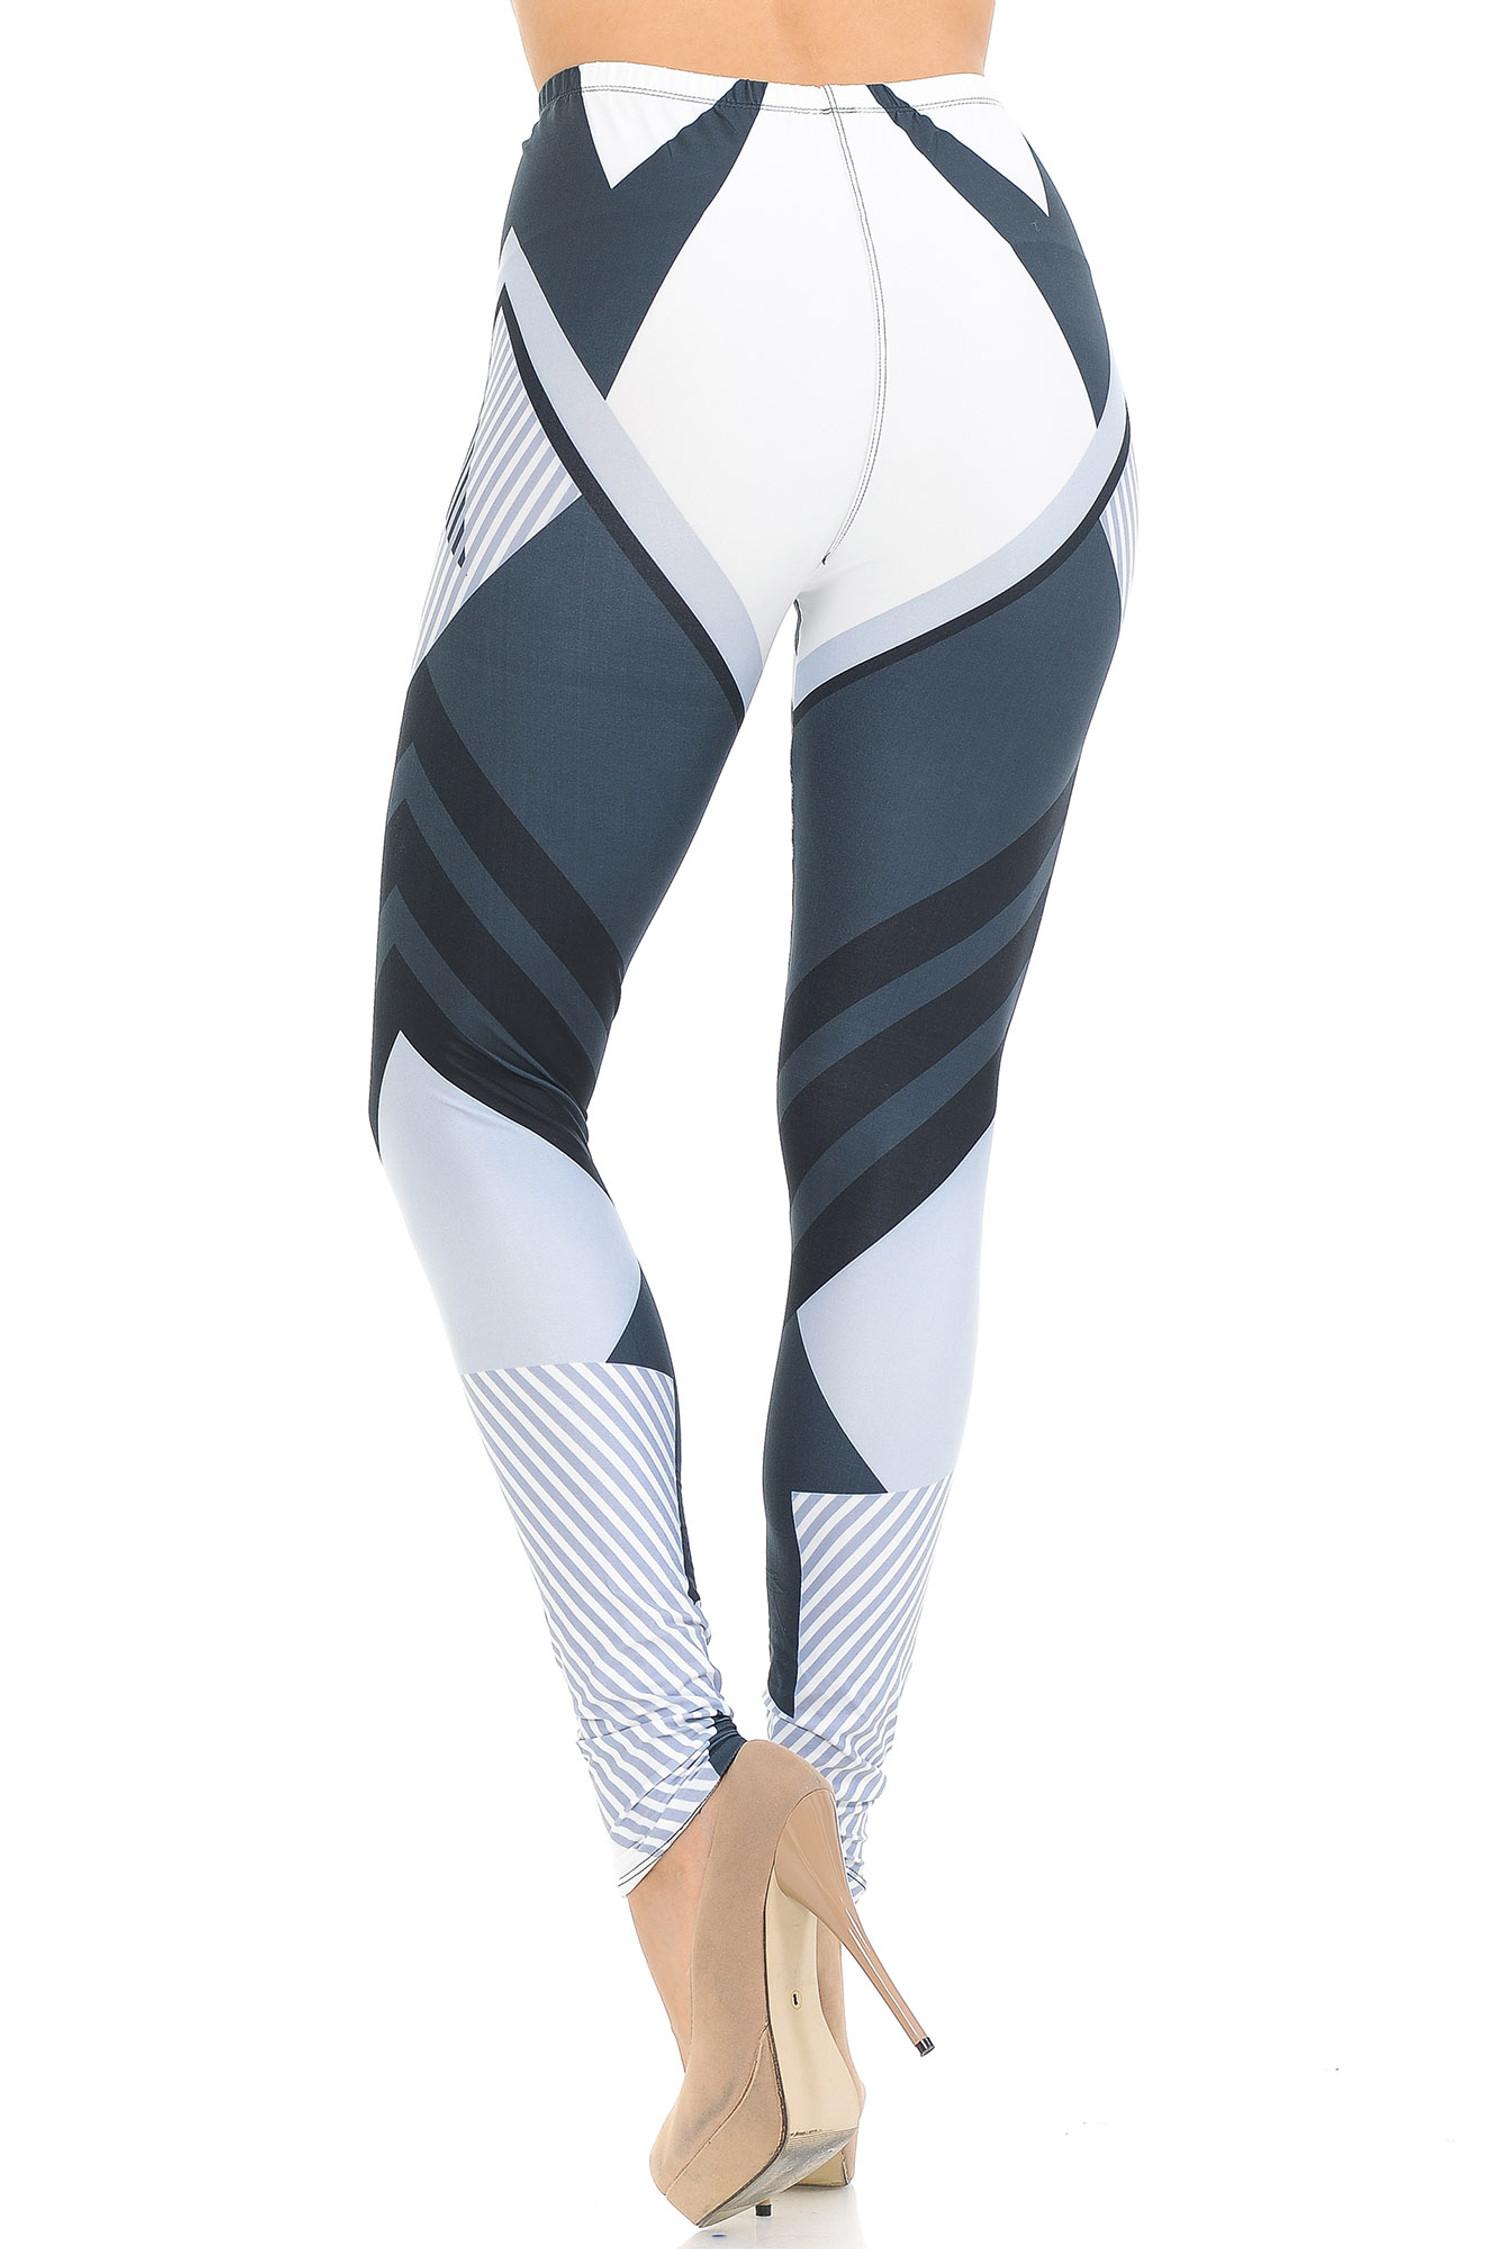 Creamy Soft Contour Angles Leggings - USA Fashion™